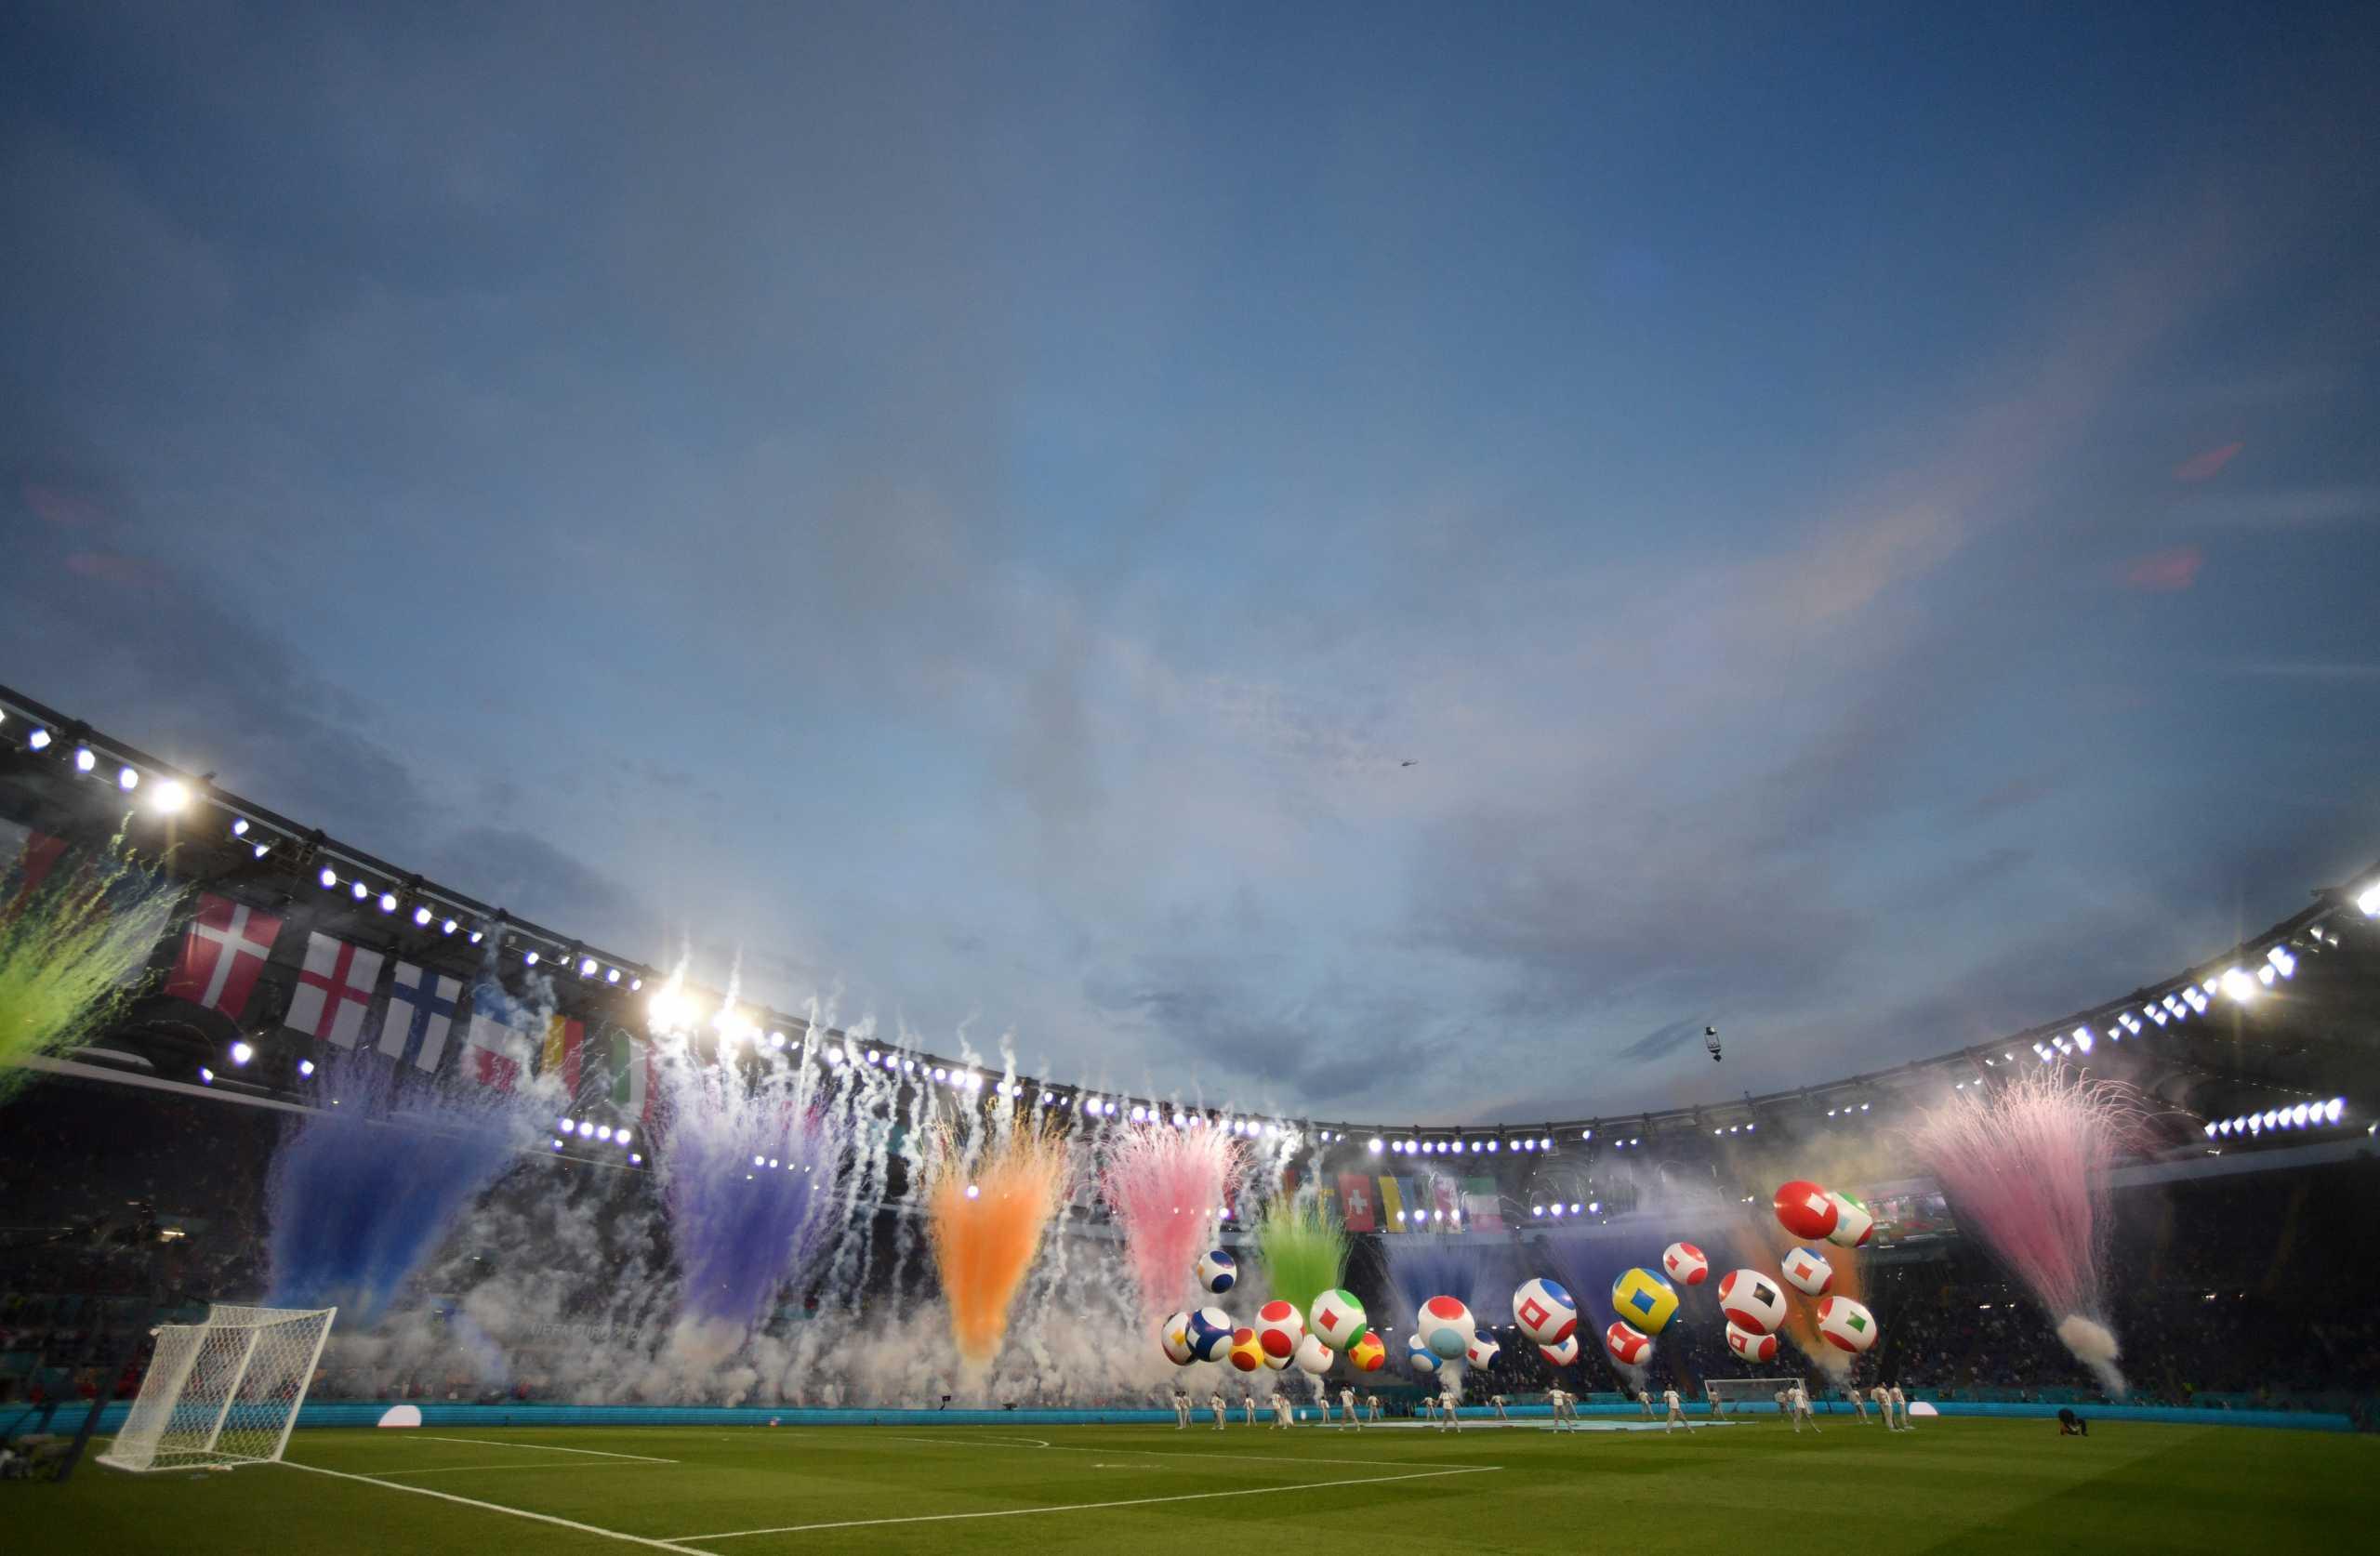 Euro 2020: Η «μαγική» τελετή έναρξης από τους Ιταλούς στο «Ολίμπικο»